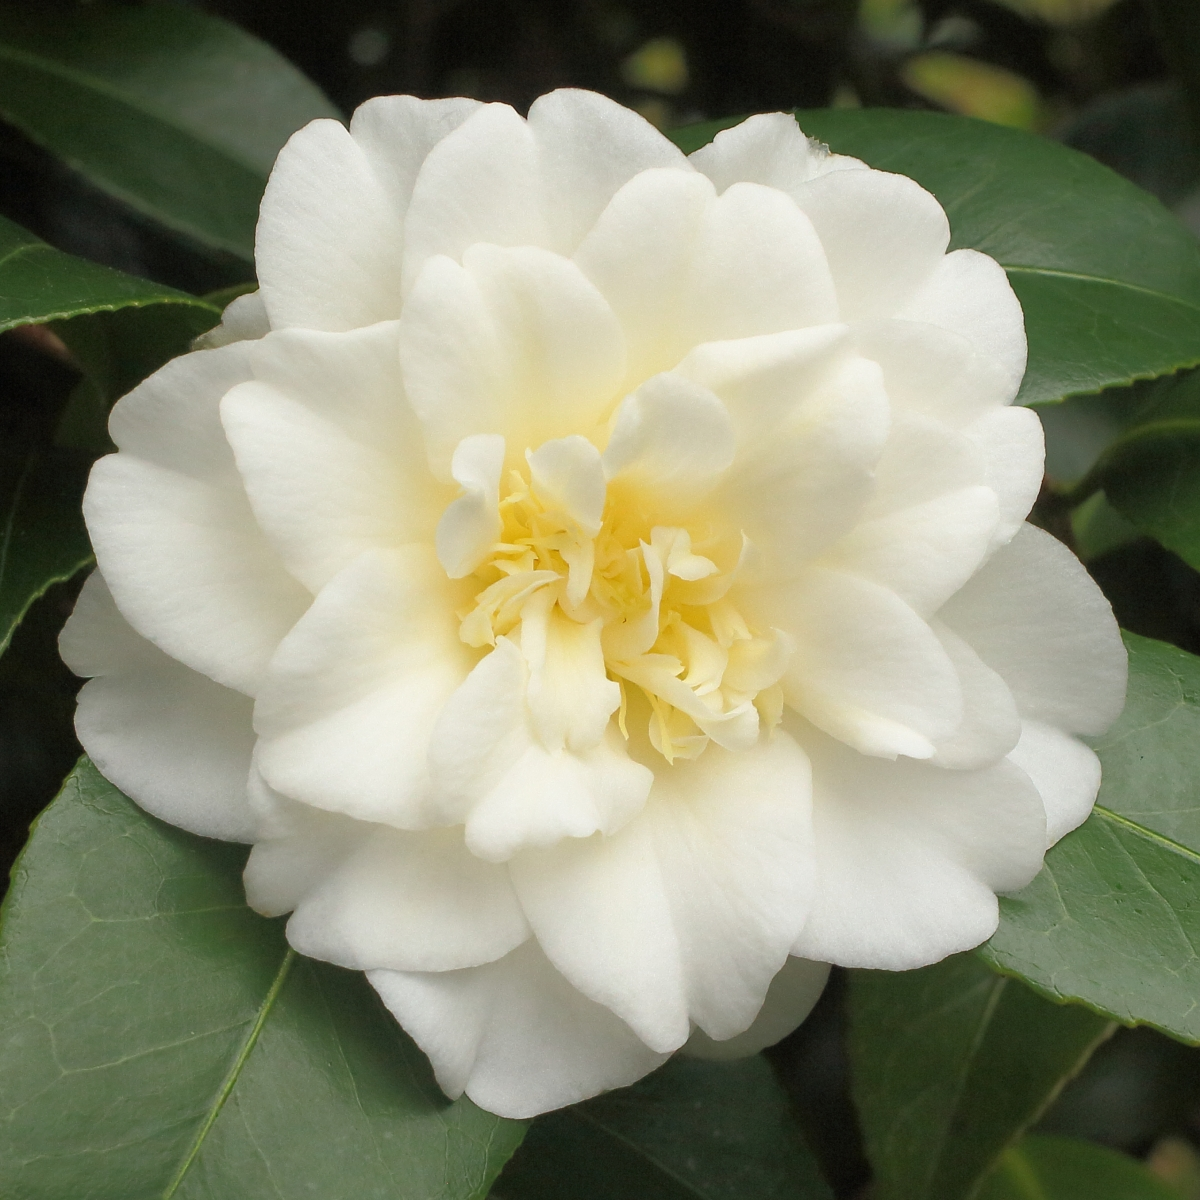 Camellia japonica 'Golden Tone'